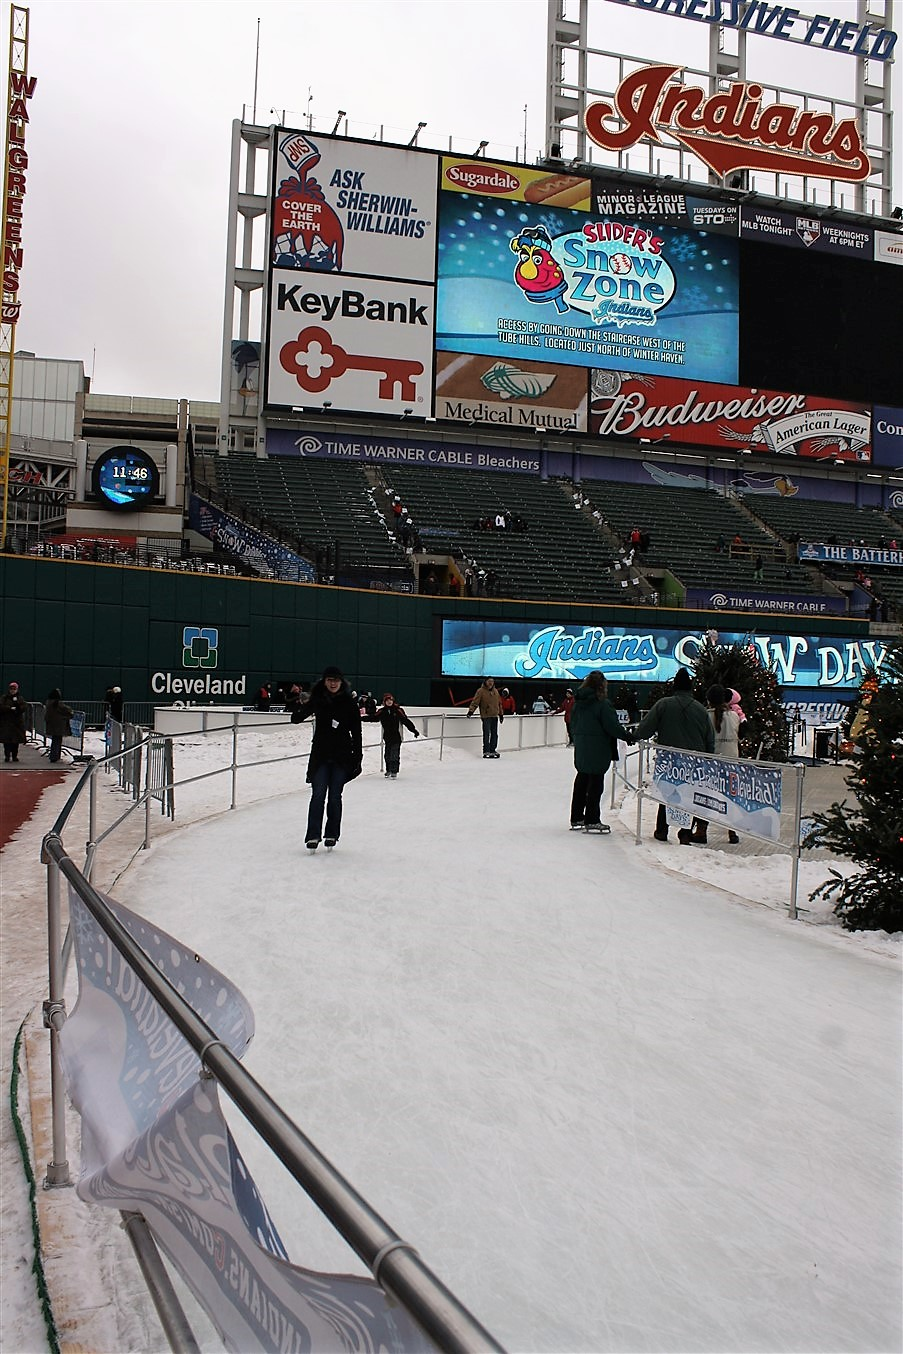 2010 12 27 Cleveland Jacobs Field Snow Days 5.jpg